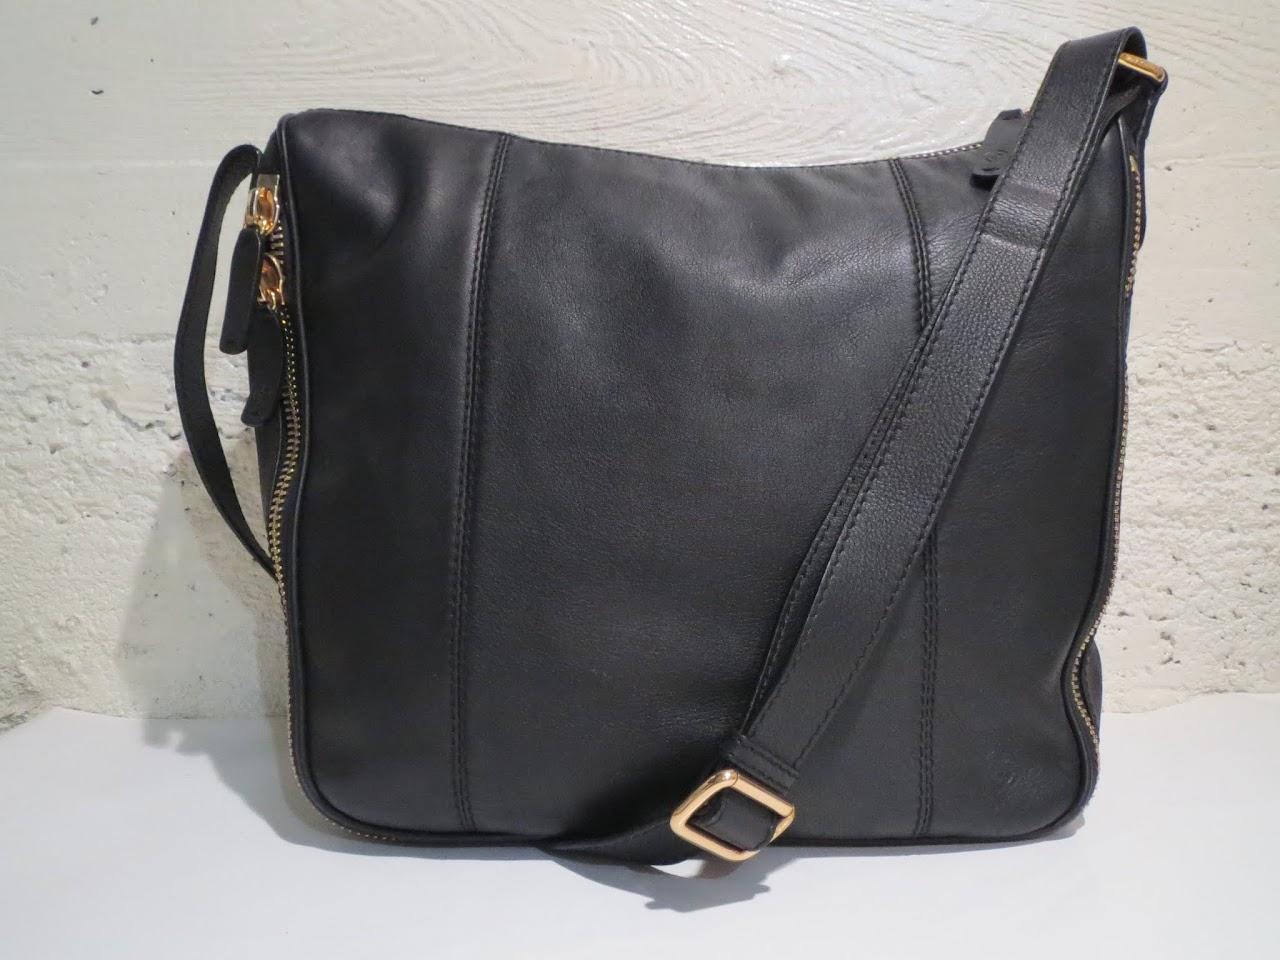 Giorgio Armani Black and Gold Shoulder Bag